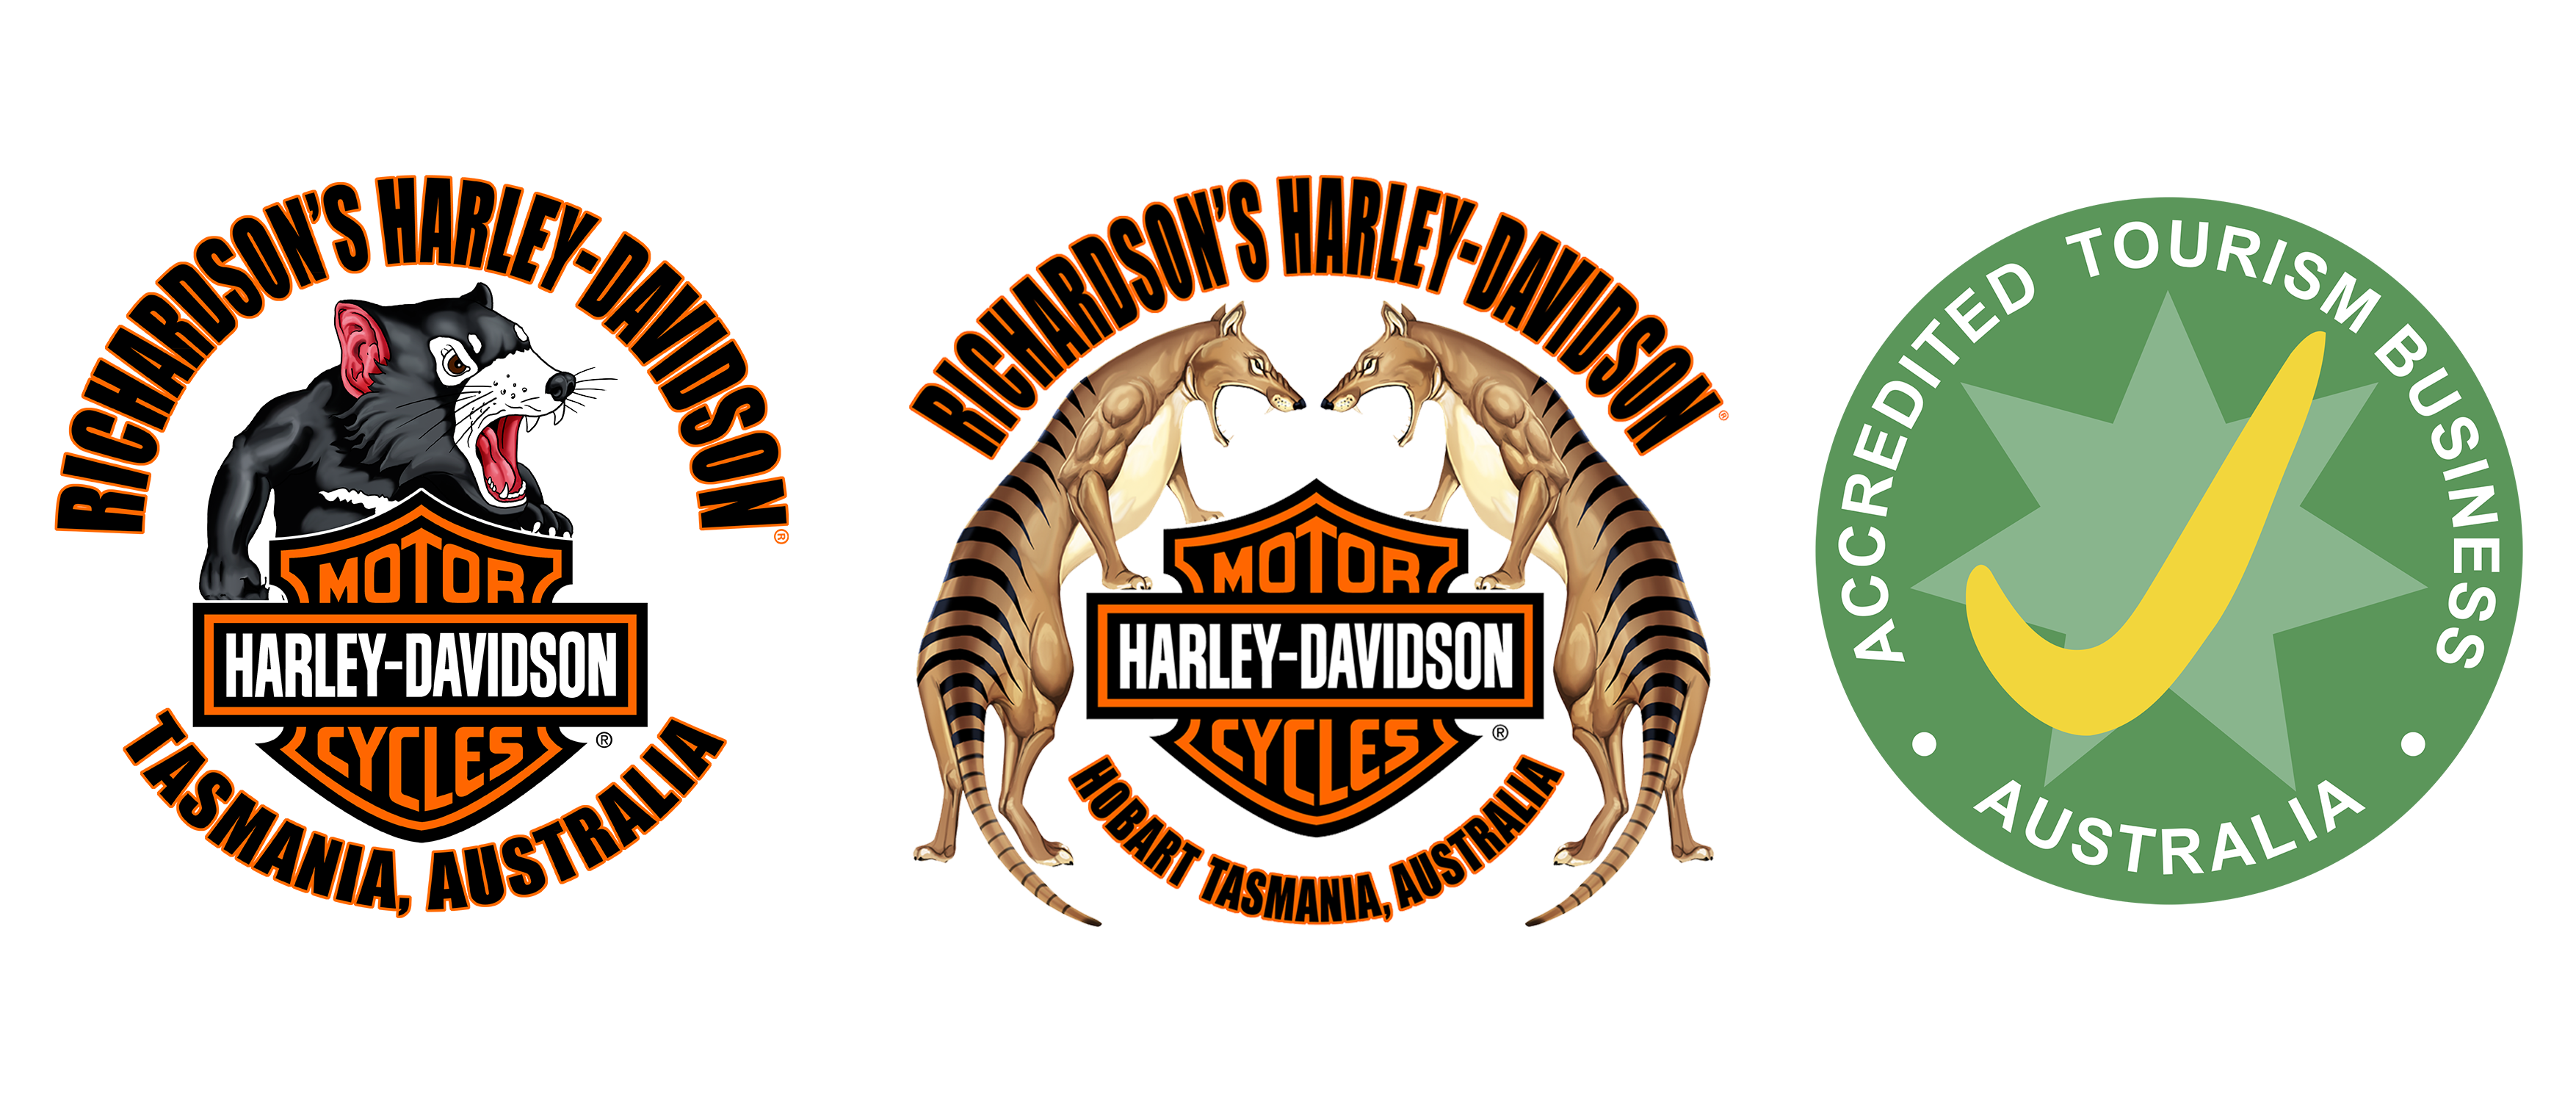 Richardson's Harley-Davidson<sup>®</sup>